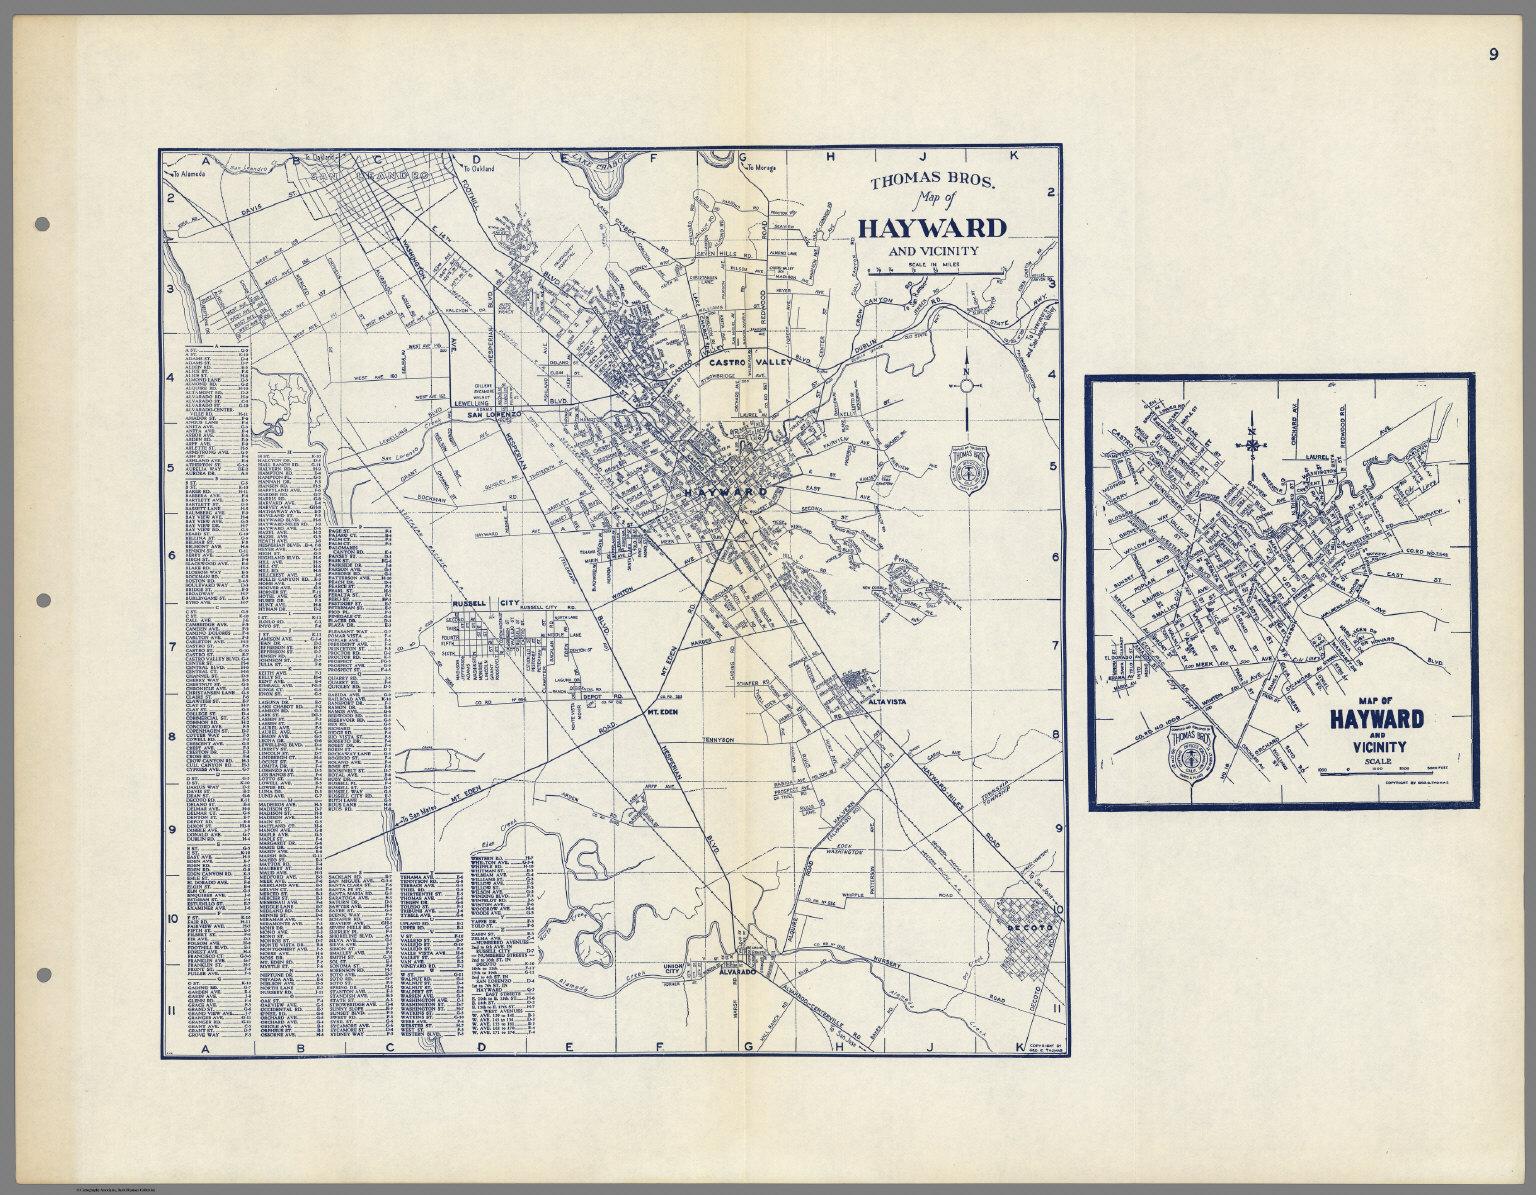 Thomas Bros Map of Hayward and Vicinity San Lorenzo Russell City